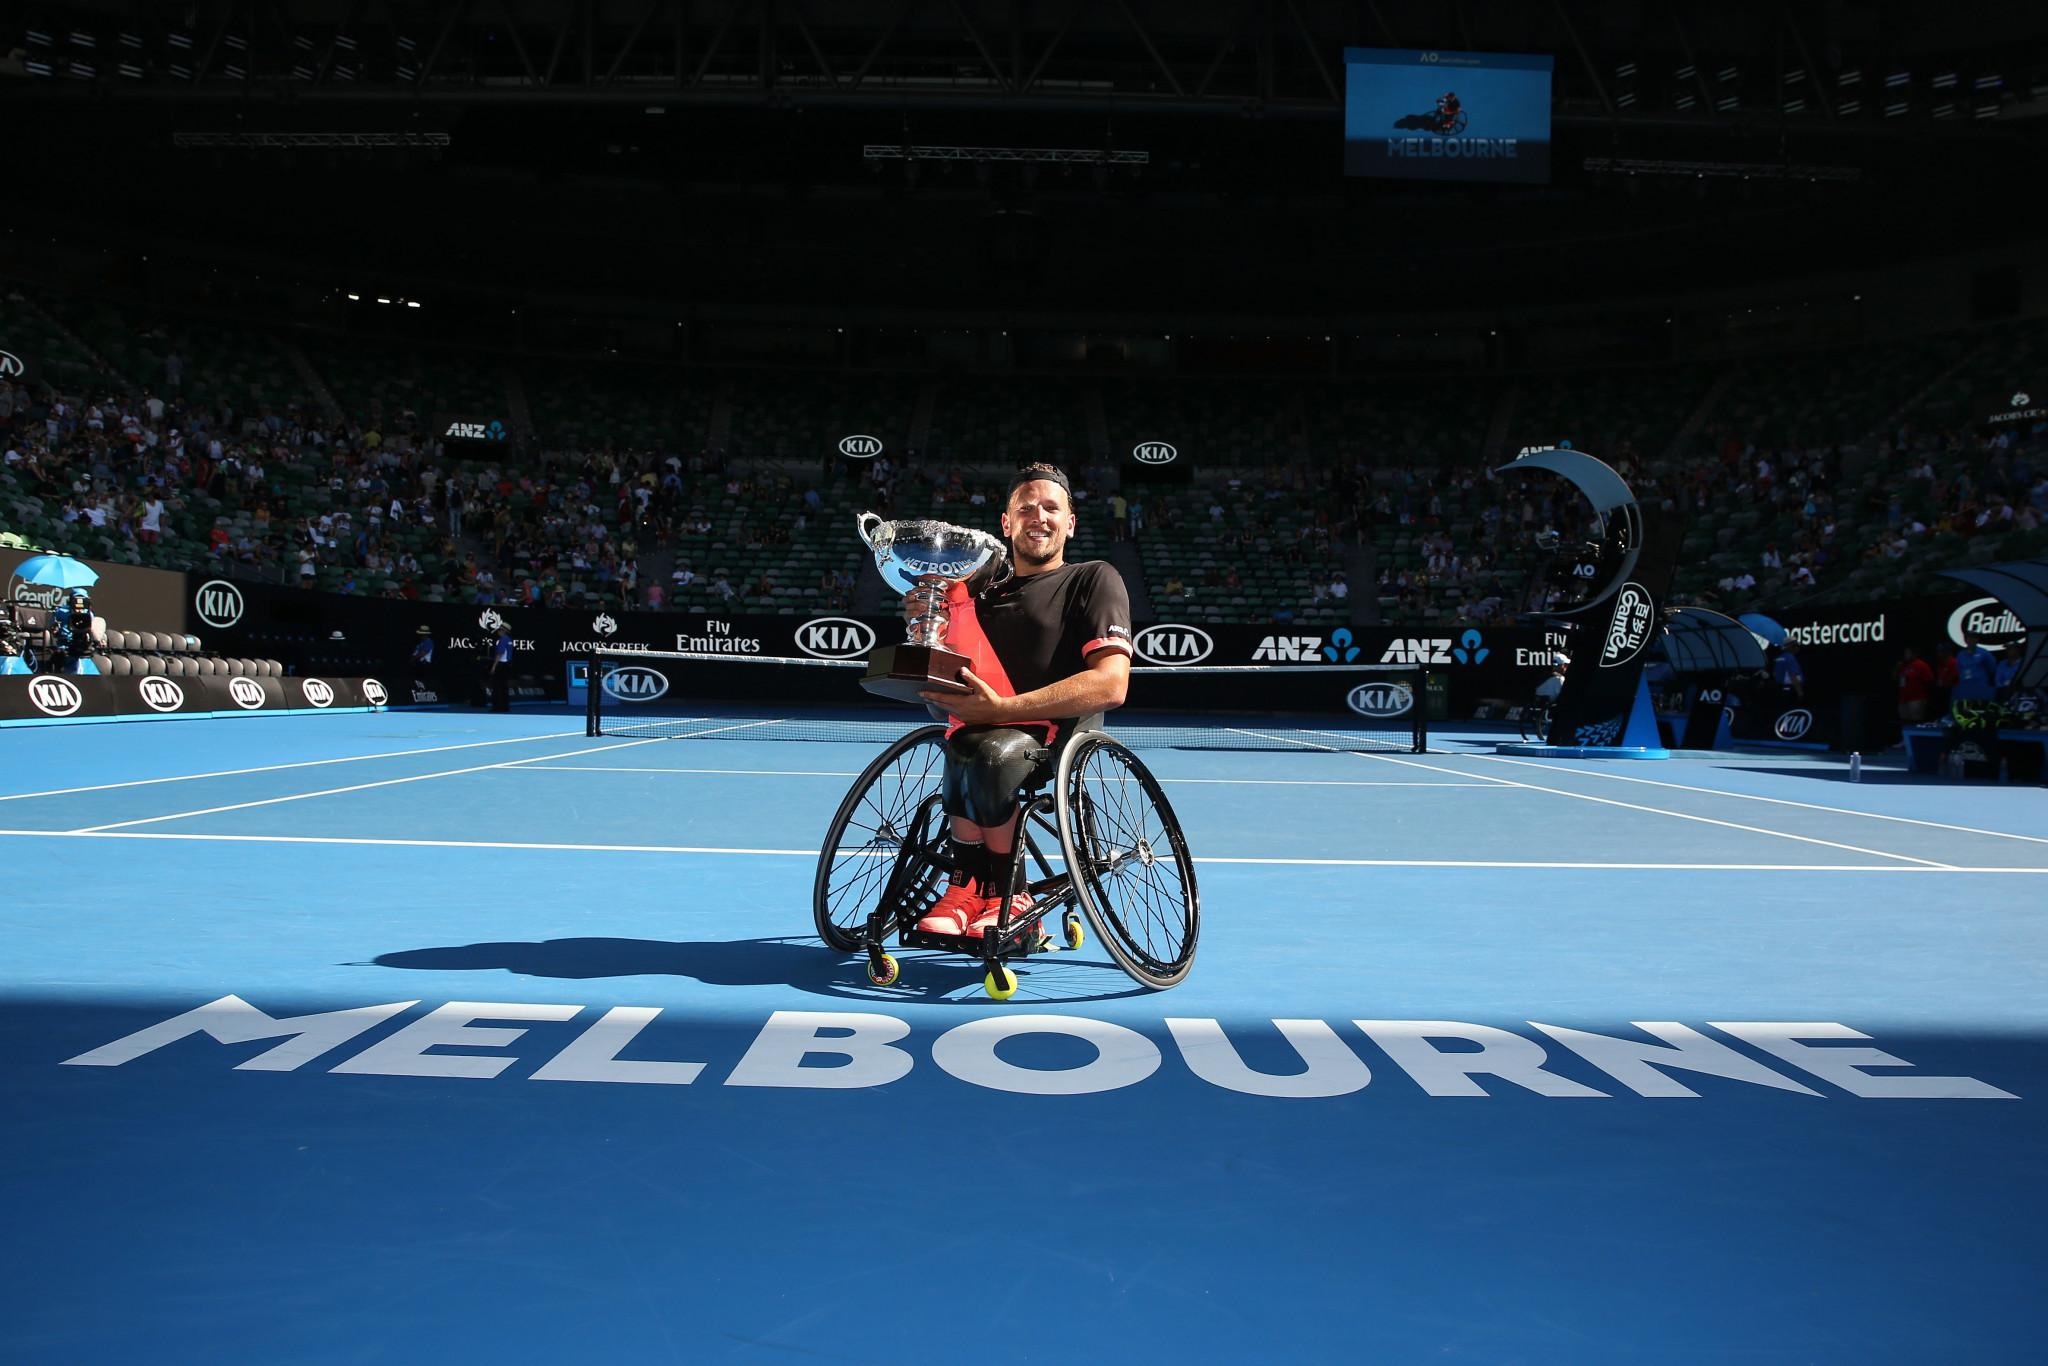 Alcott clinches fourth consecutive quad singles title at Australian Open